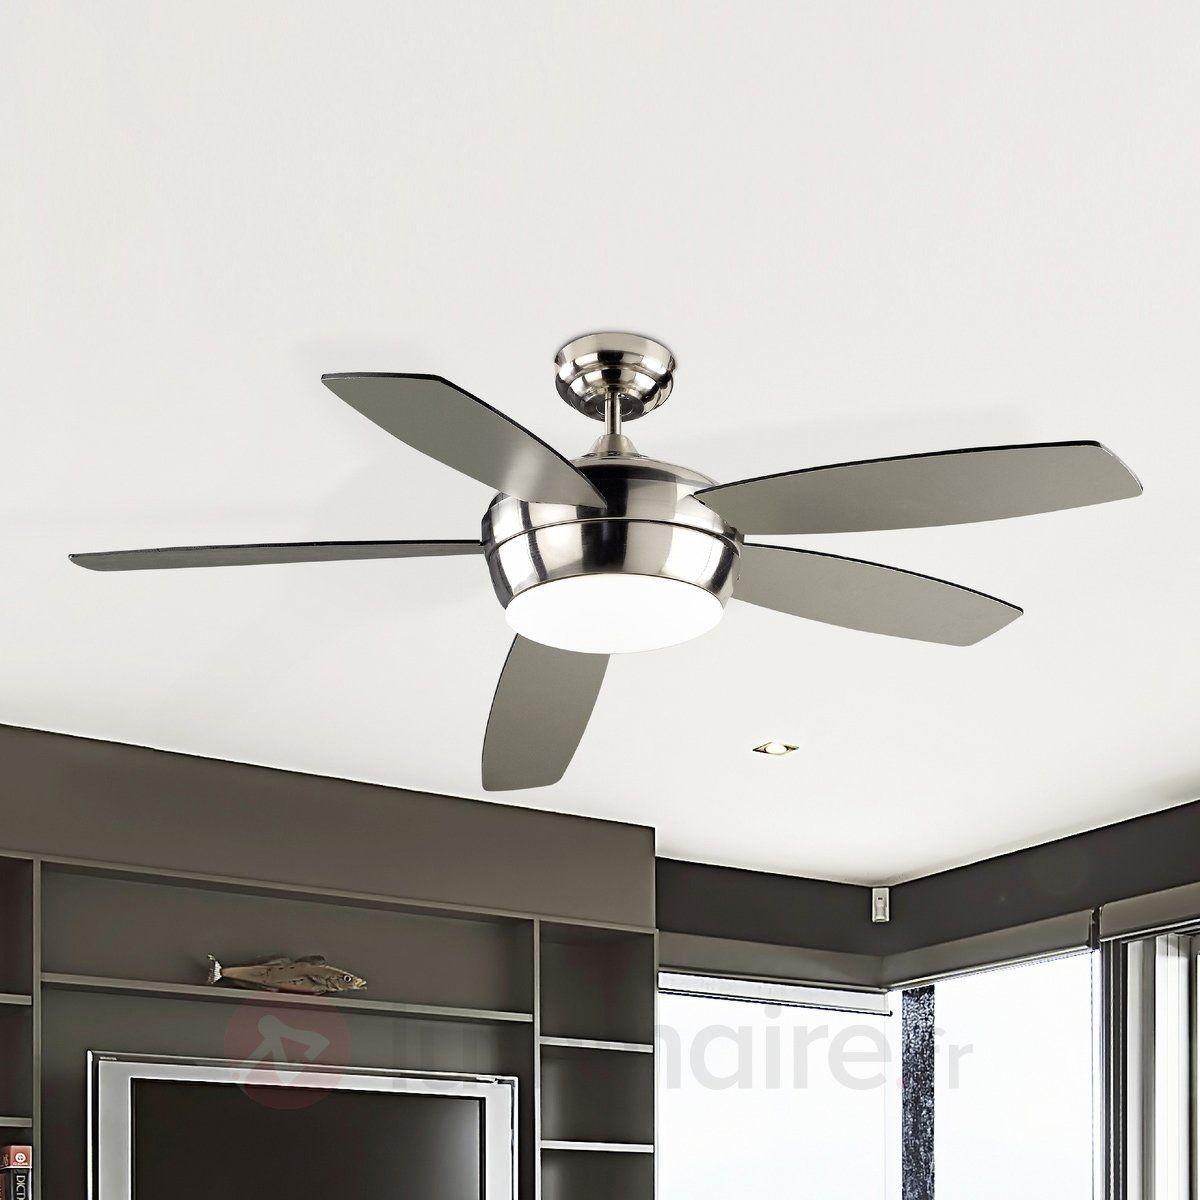 Ventilateur De Plafond Samal Avec Telecommande Reference 6026191 Ventilateurs De Plafond Ou A Poser Che Ventilateur Plafond Luminaire Plafonnier Ventilateur